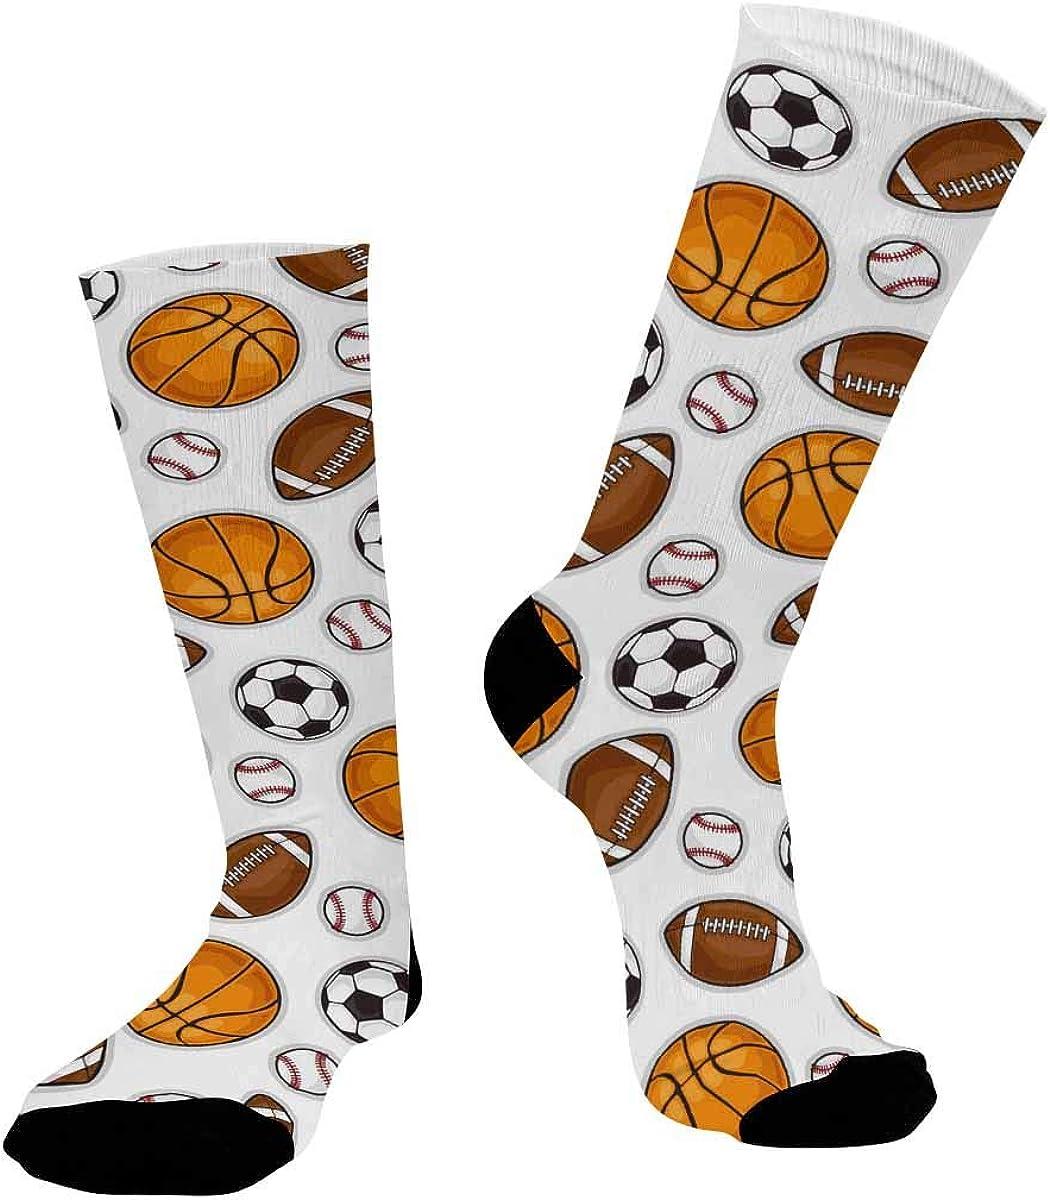 INTERESTPRINT Sublimated Hiking Dress Athletic Crew Socks Sporting Equipment Pattern